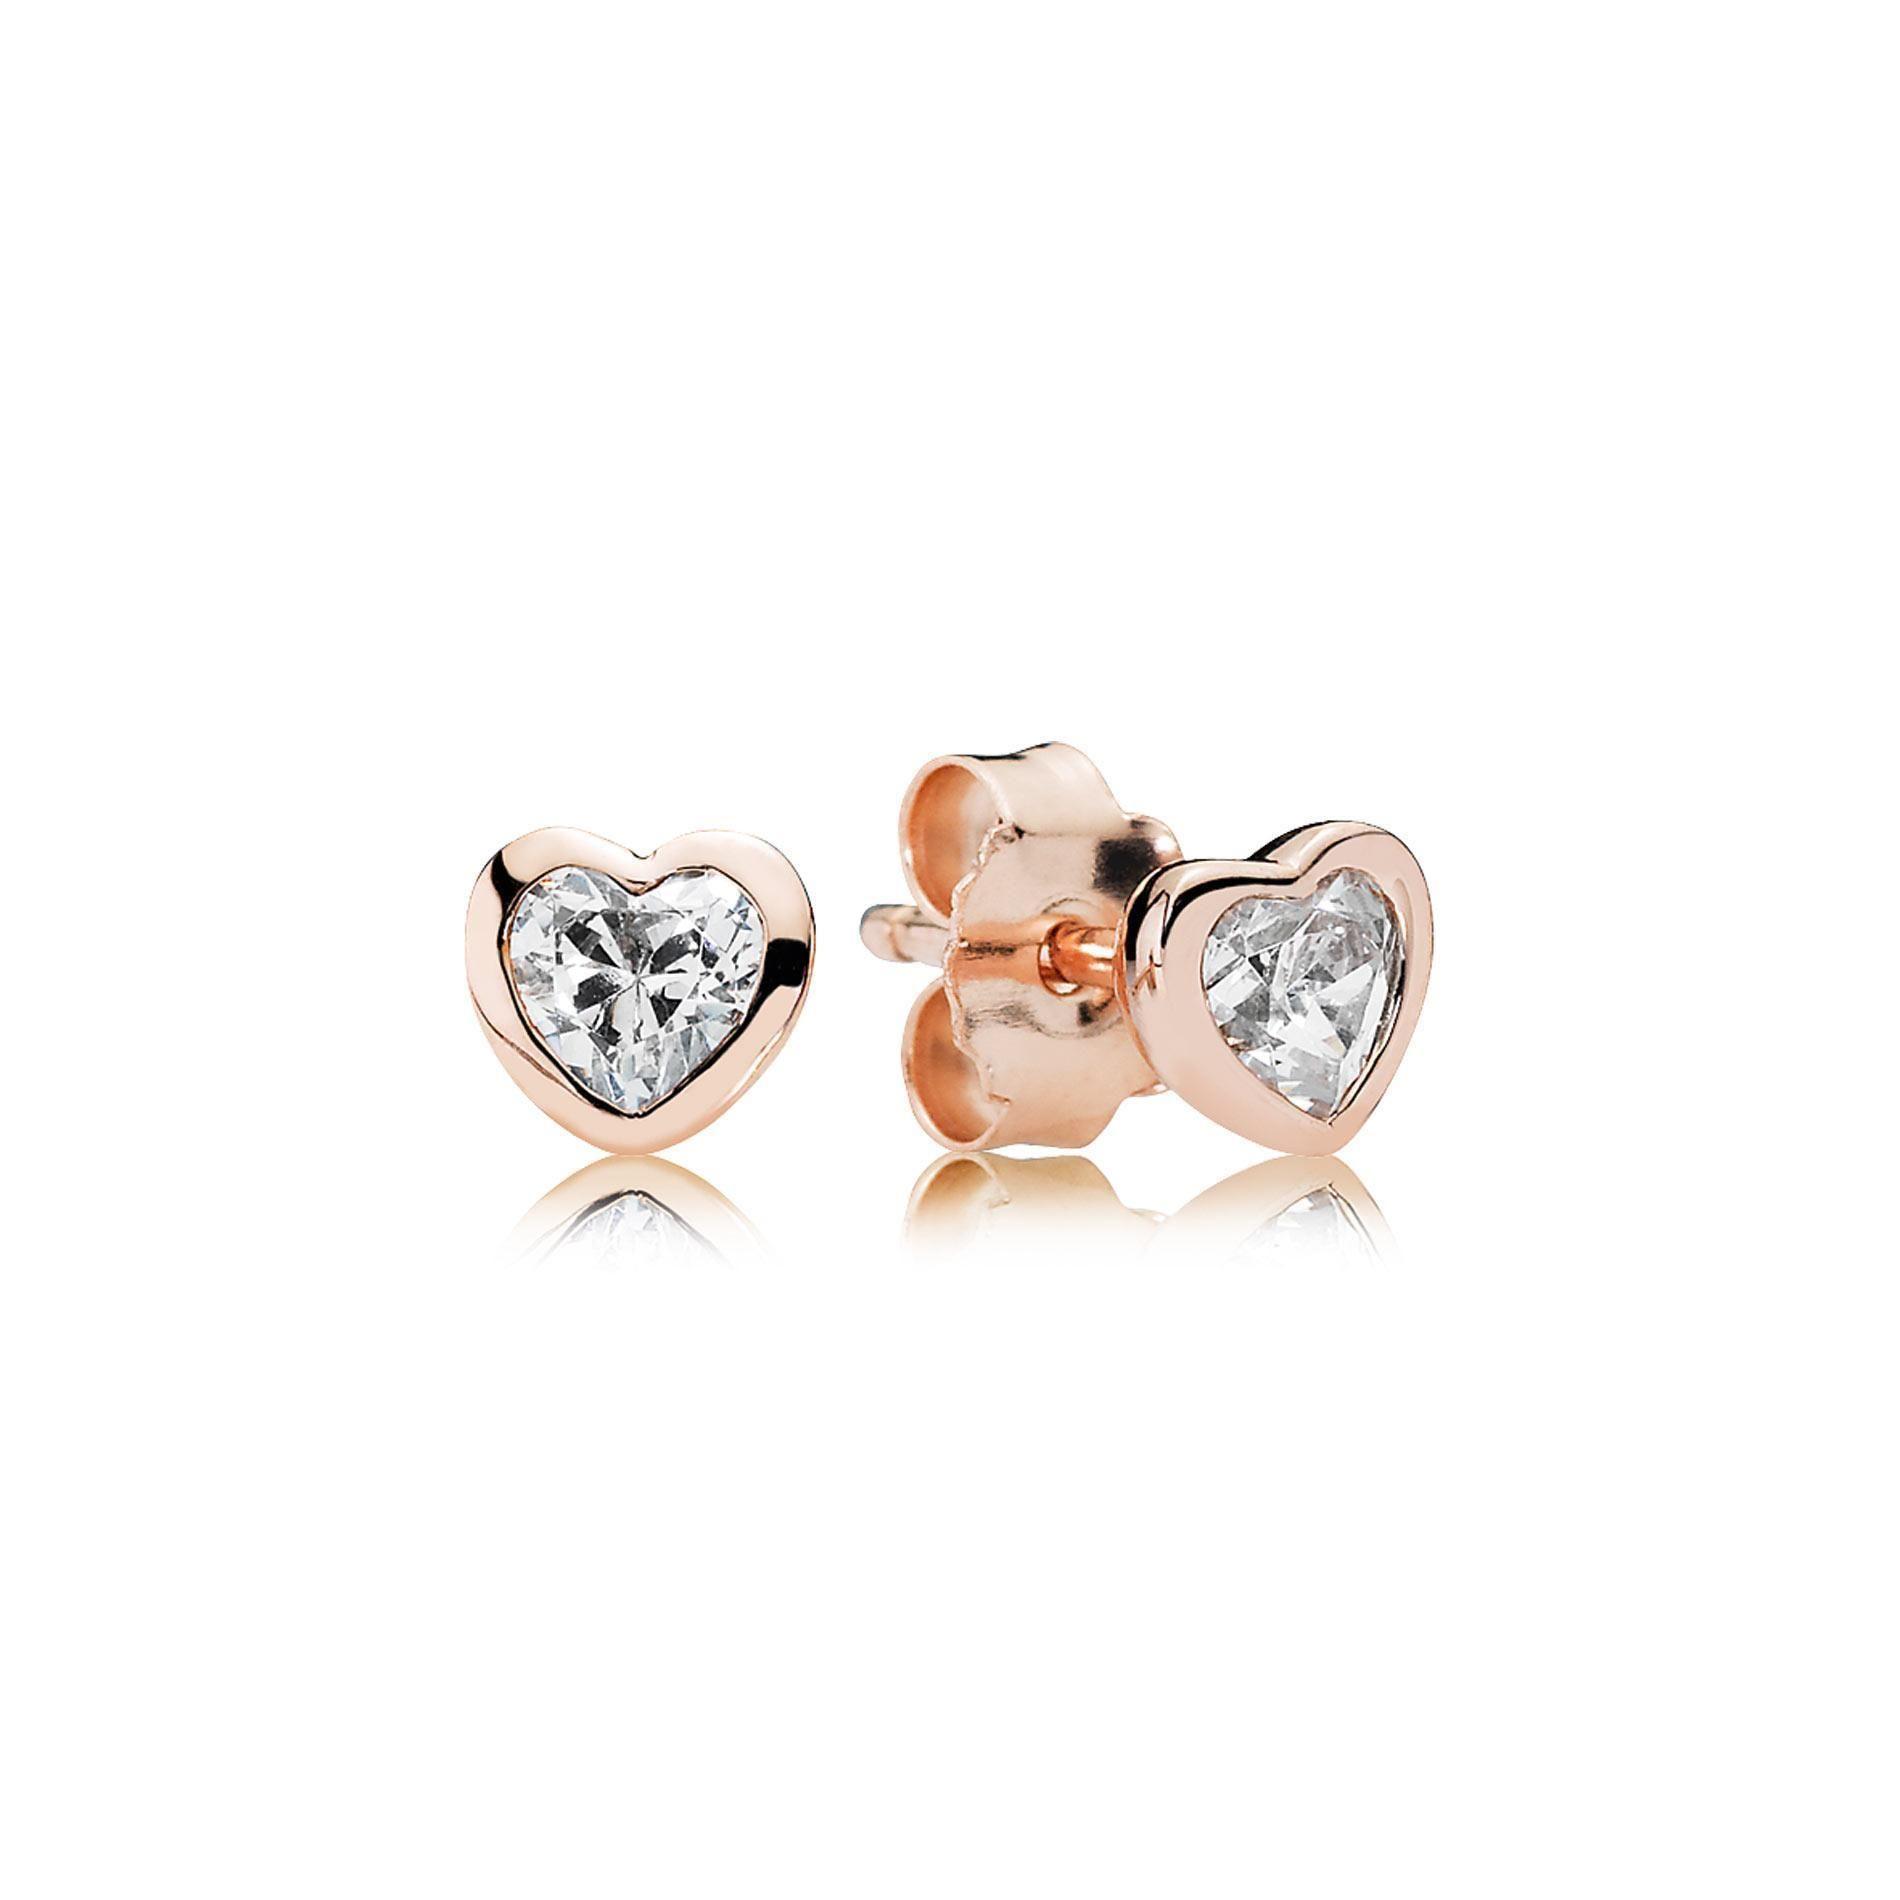 Pandora Rose One Love Earrings Item 19515758 Pandora Earrings Pandora Earrings Studs Pandora Jewelry